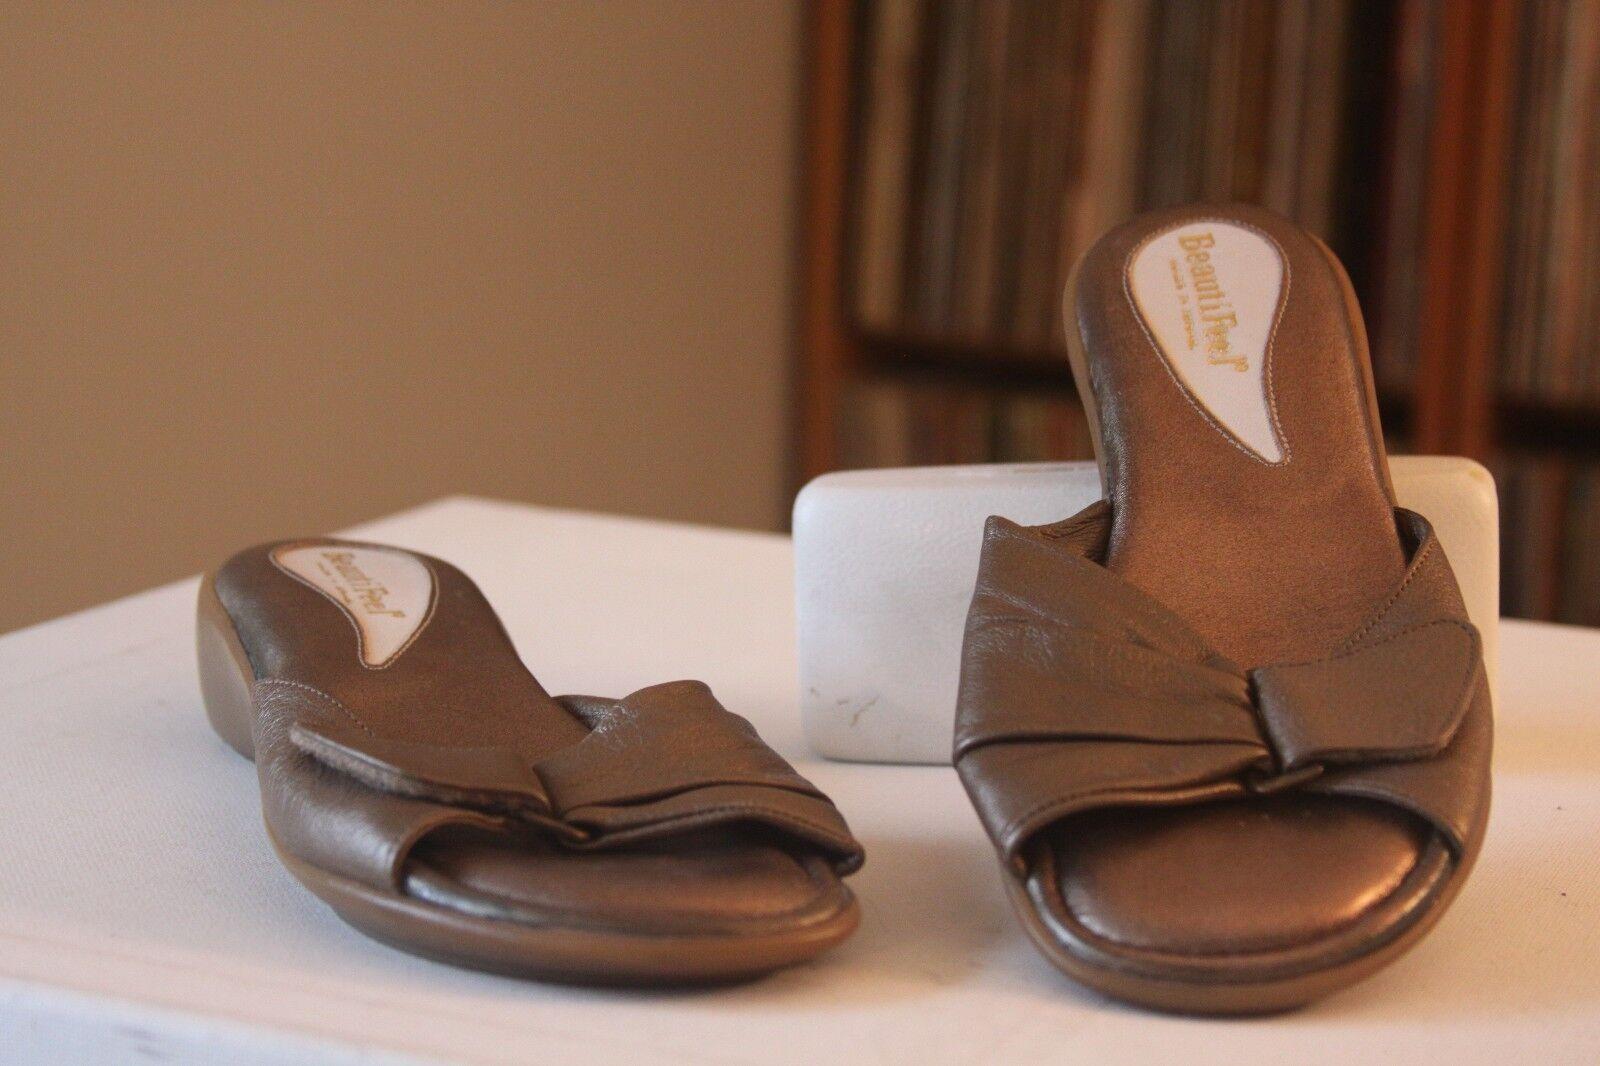 BeautiFeel 37 Pineapple Bronze Leather Buckle Strap Sandals Size 6-6.5